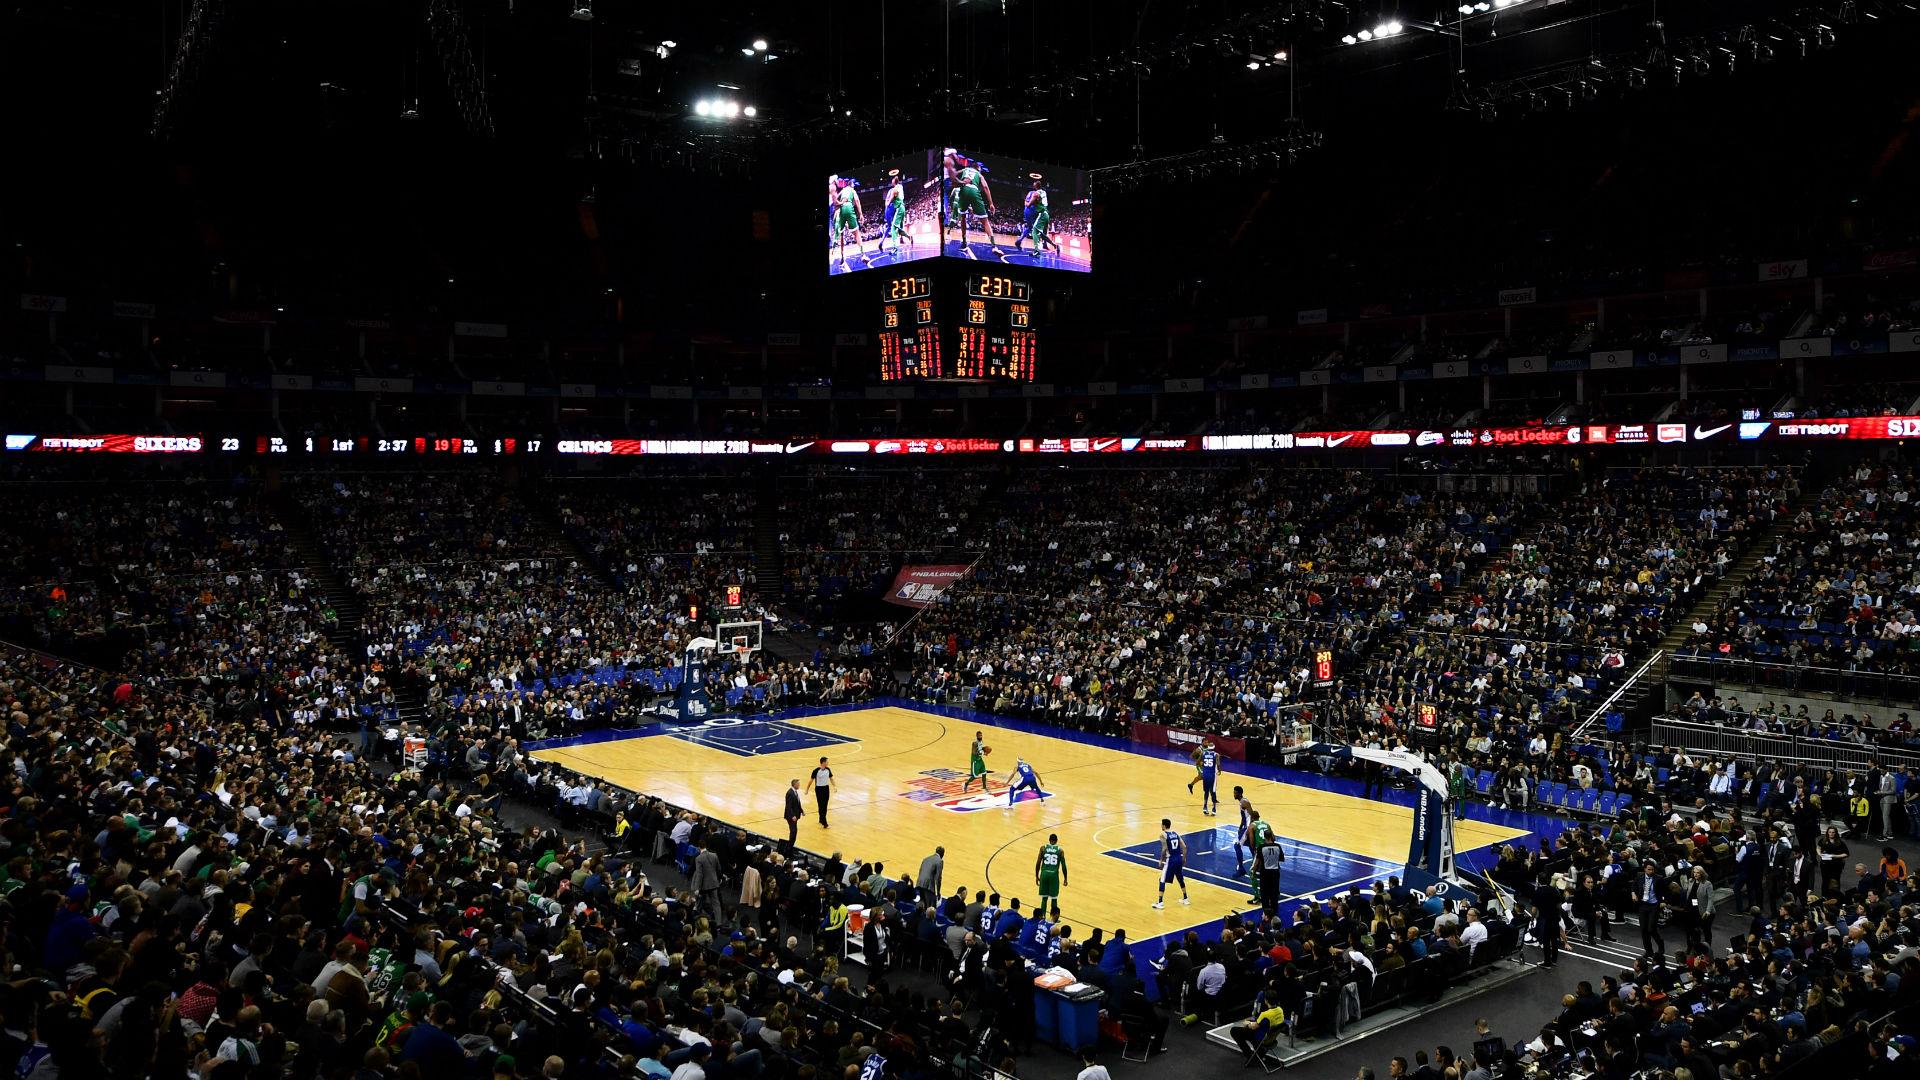 The-o2-arena-06202018-usnews-getty-ftr_1i7yigcouipiy1vf3wzmwlthlr